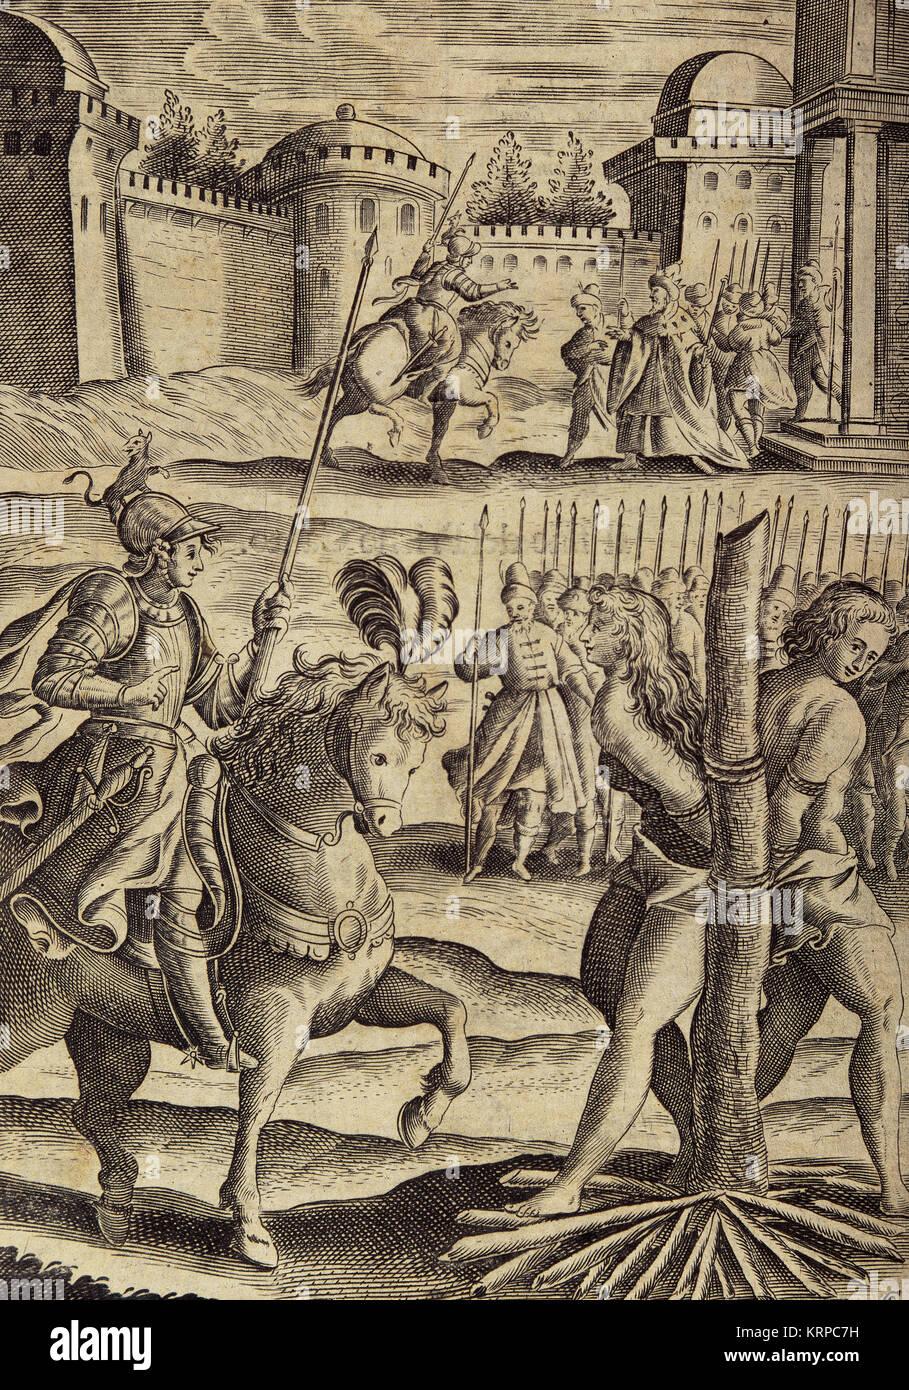 Torquato Tasso (1544-1595). Italian poet. La Gerusalemme Liberata (Jerusalem Delivered), 1580. The Saracen sorceress - Stock Image